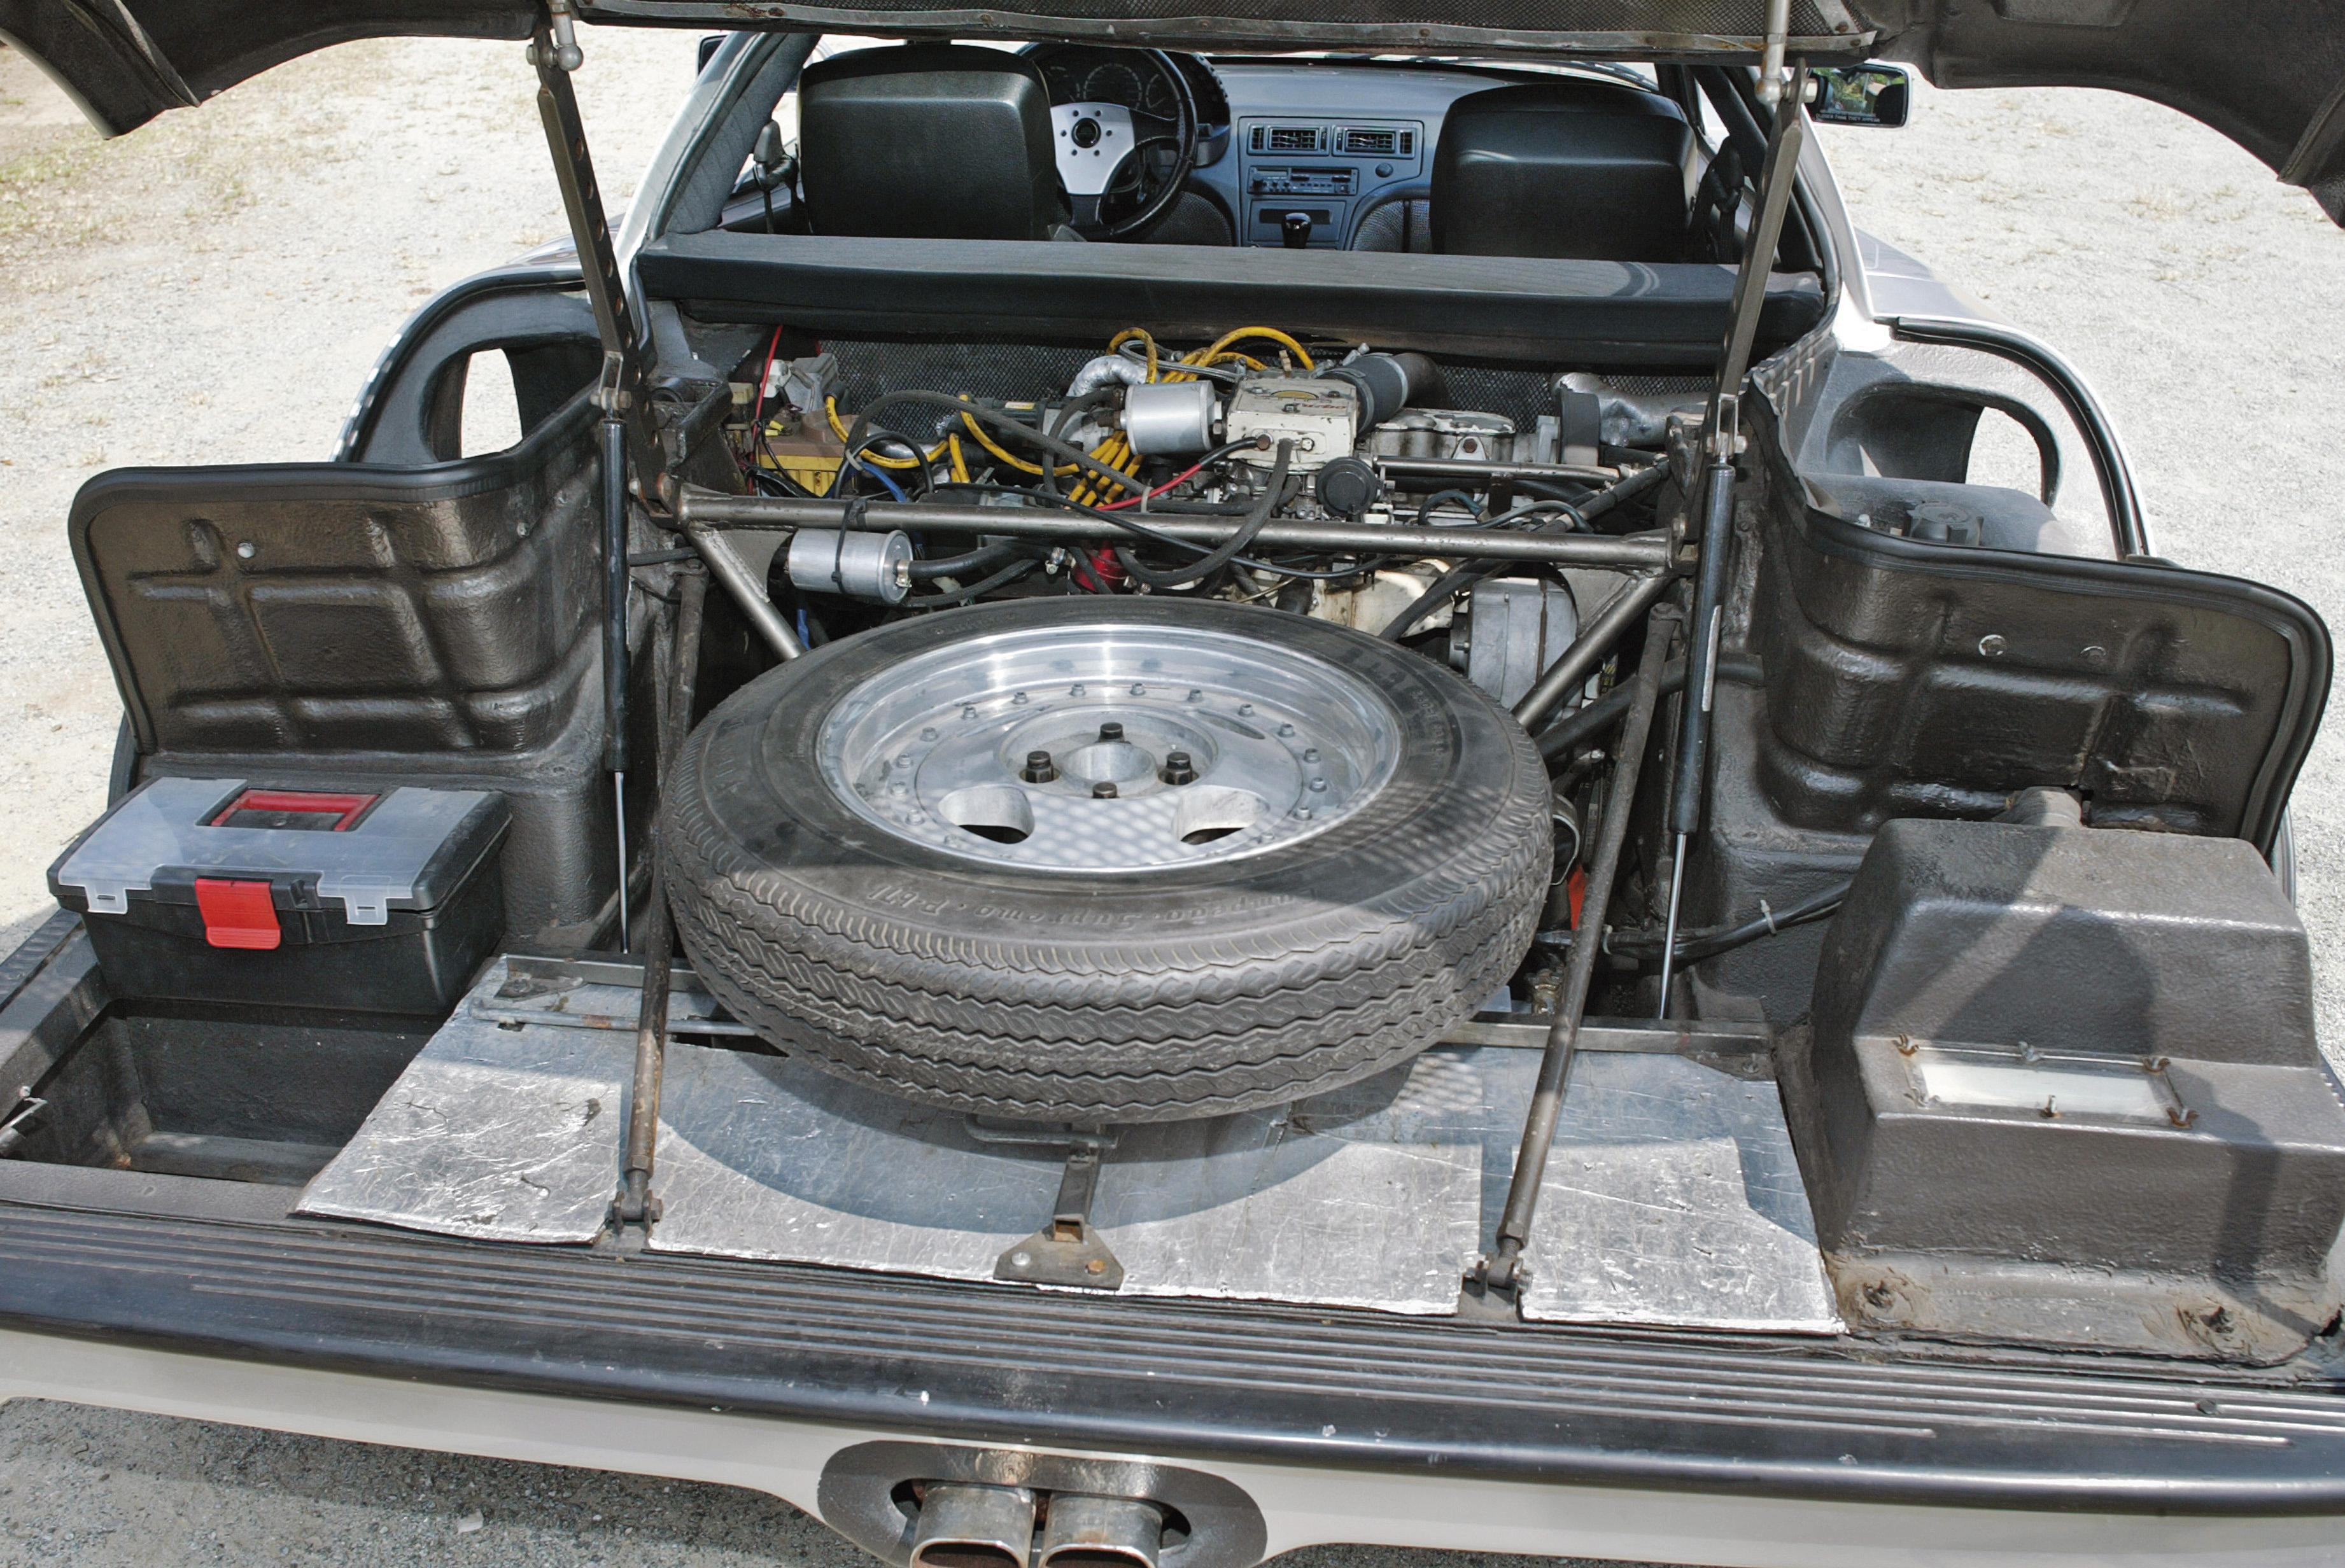 Painel do Aurora 122-C Turbo, automóvel esportivo.